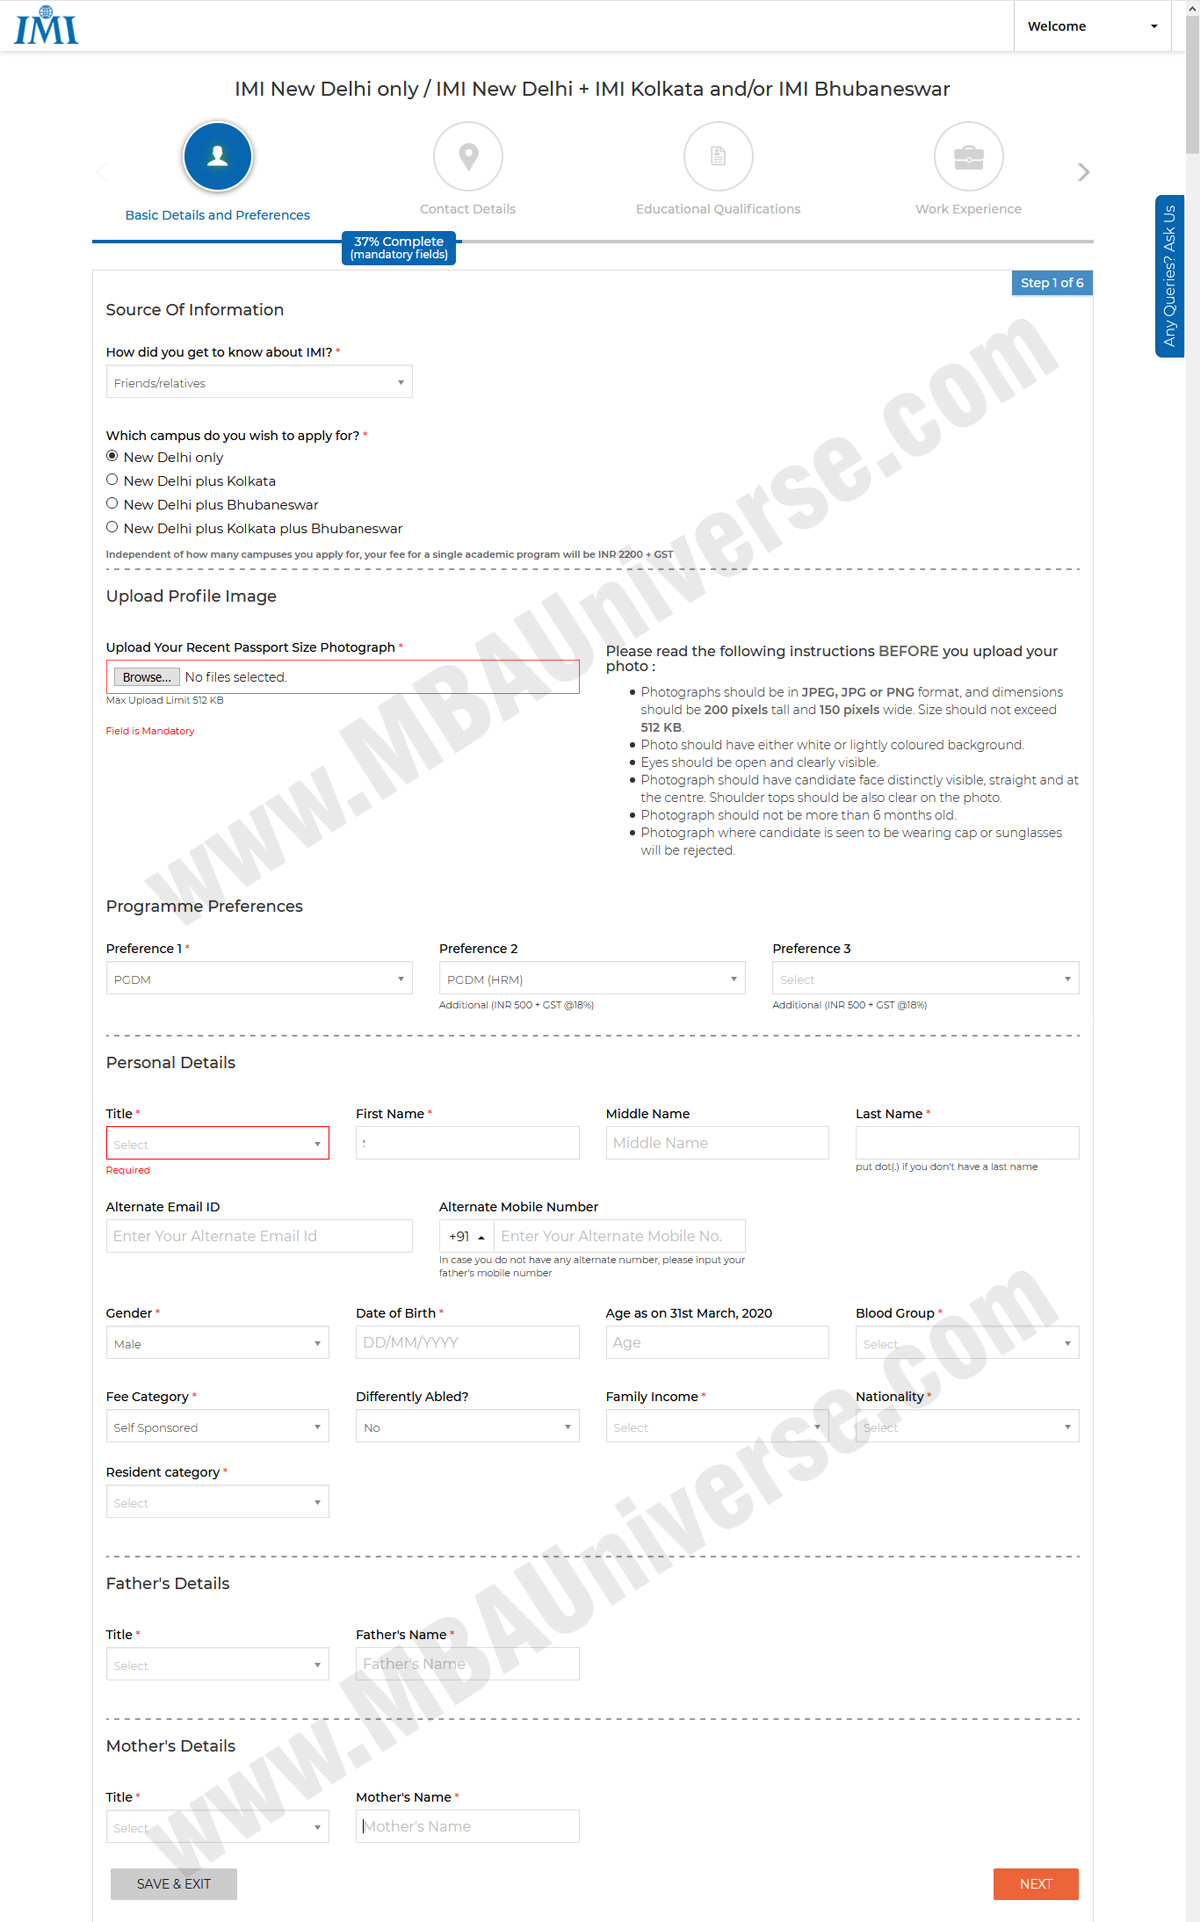 IMI New Delhi Application Process